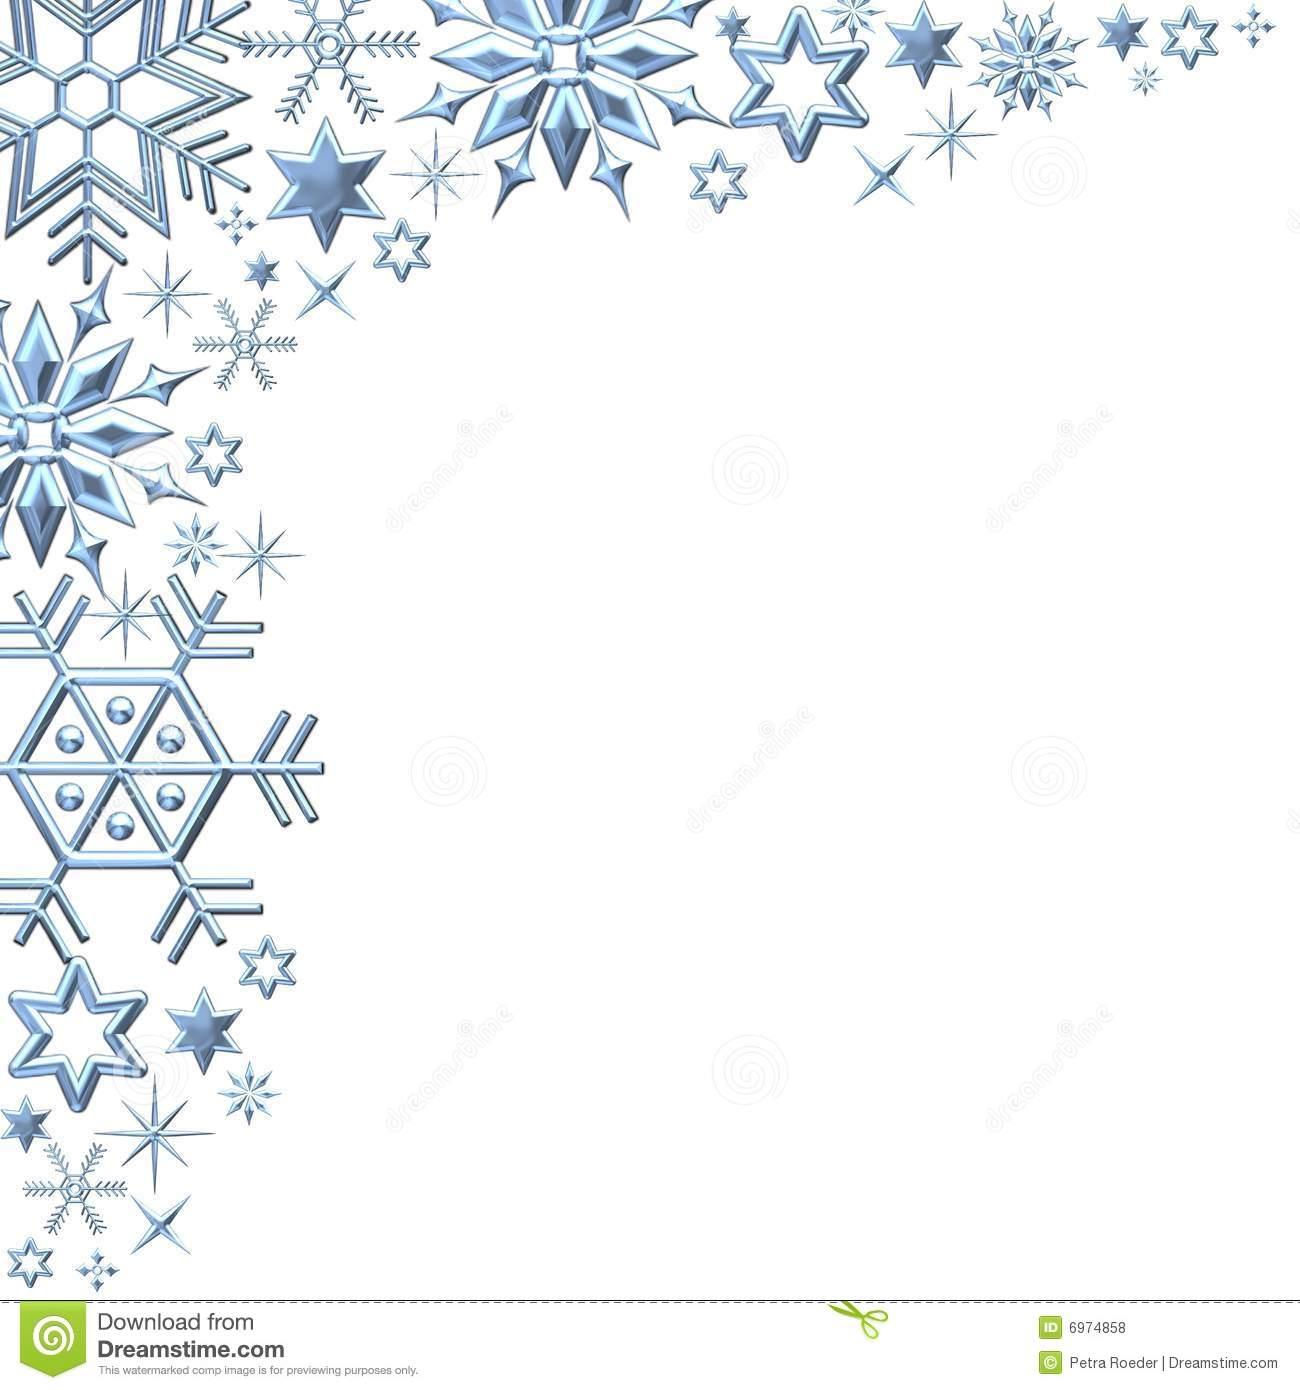 Snowflake Clipart Border.